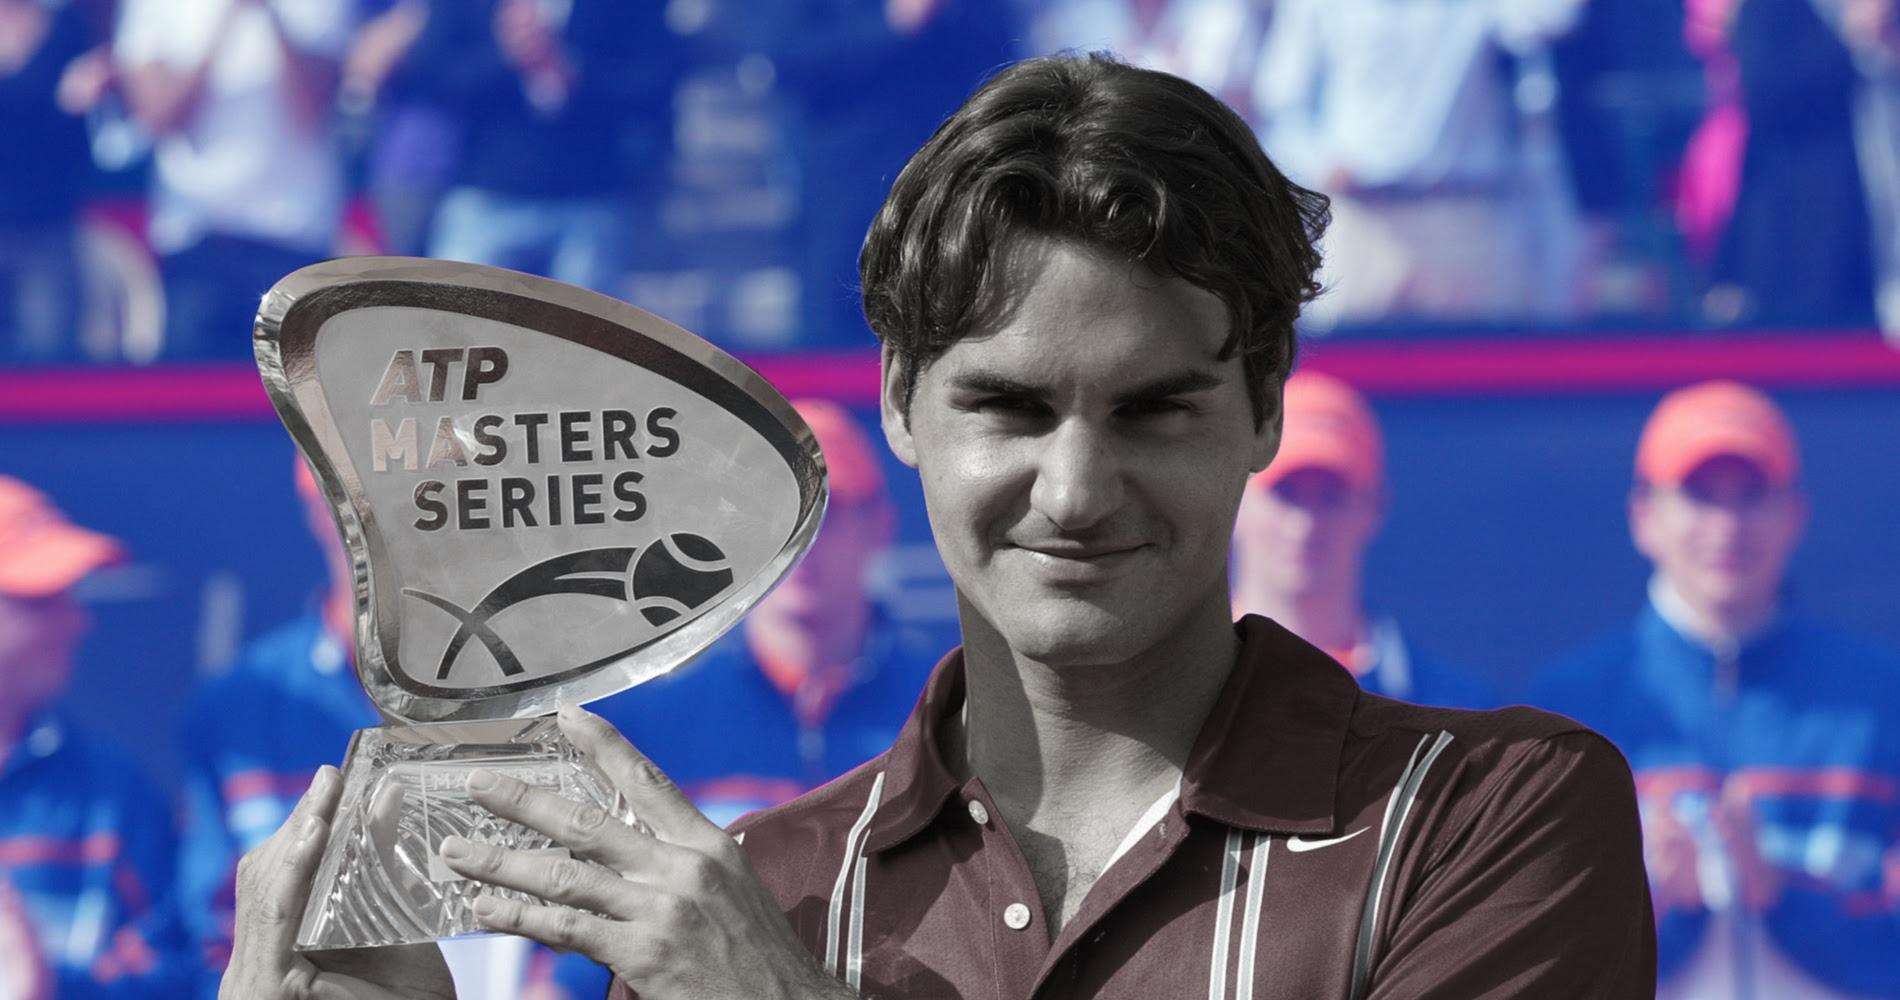 Roger Federer - On this day 20/5